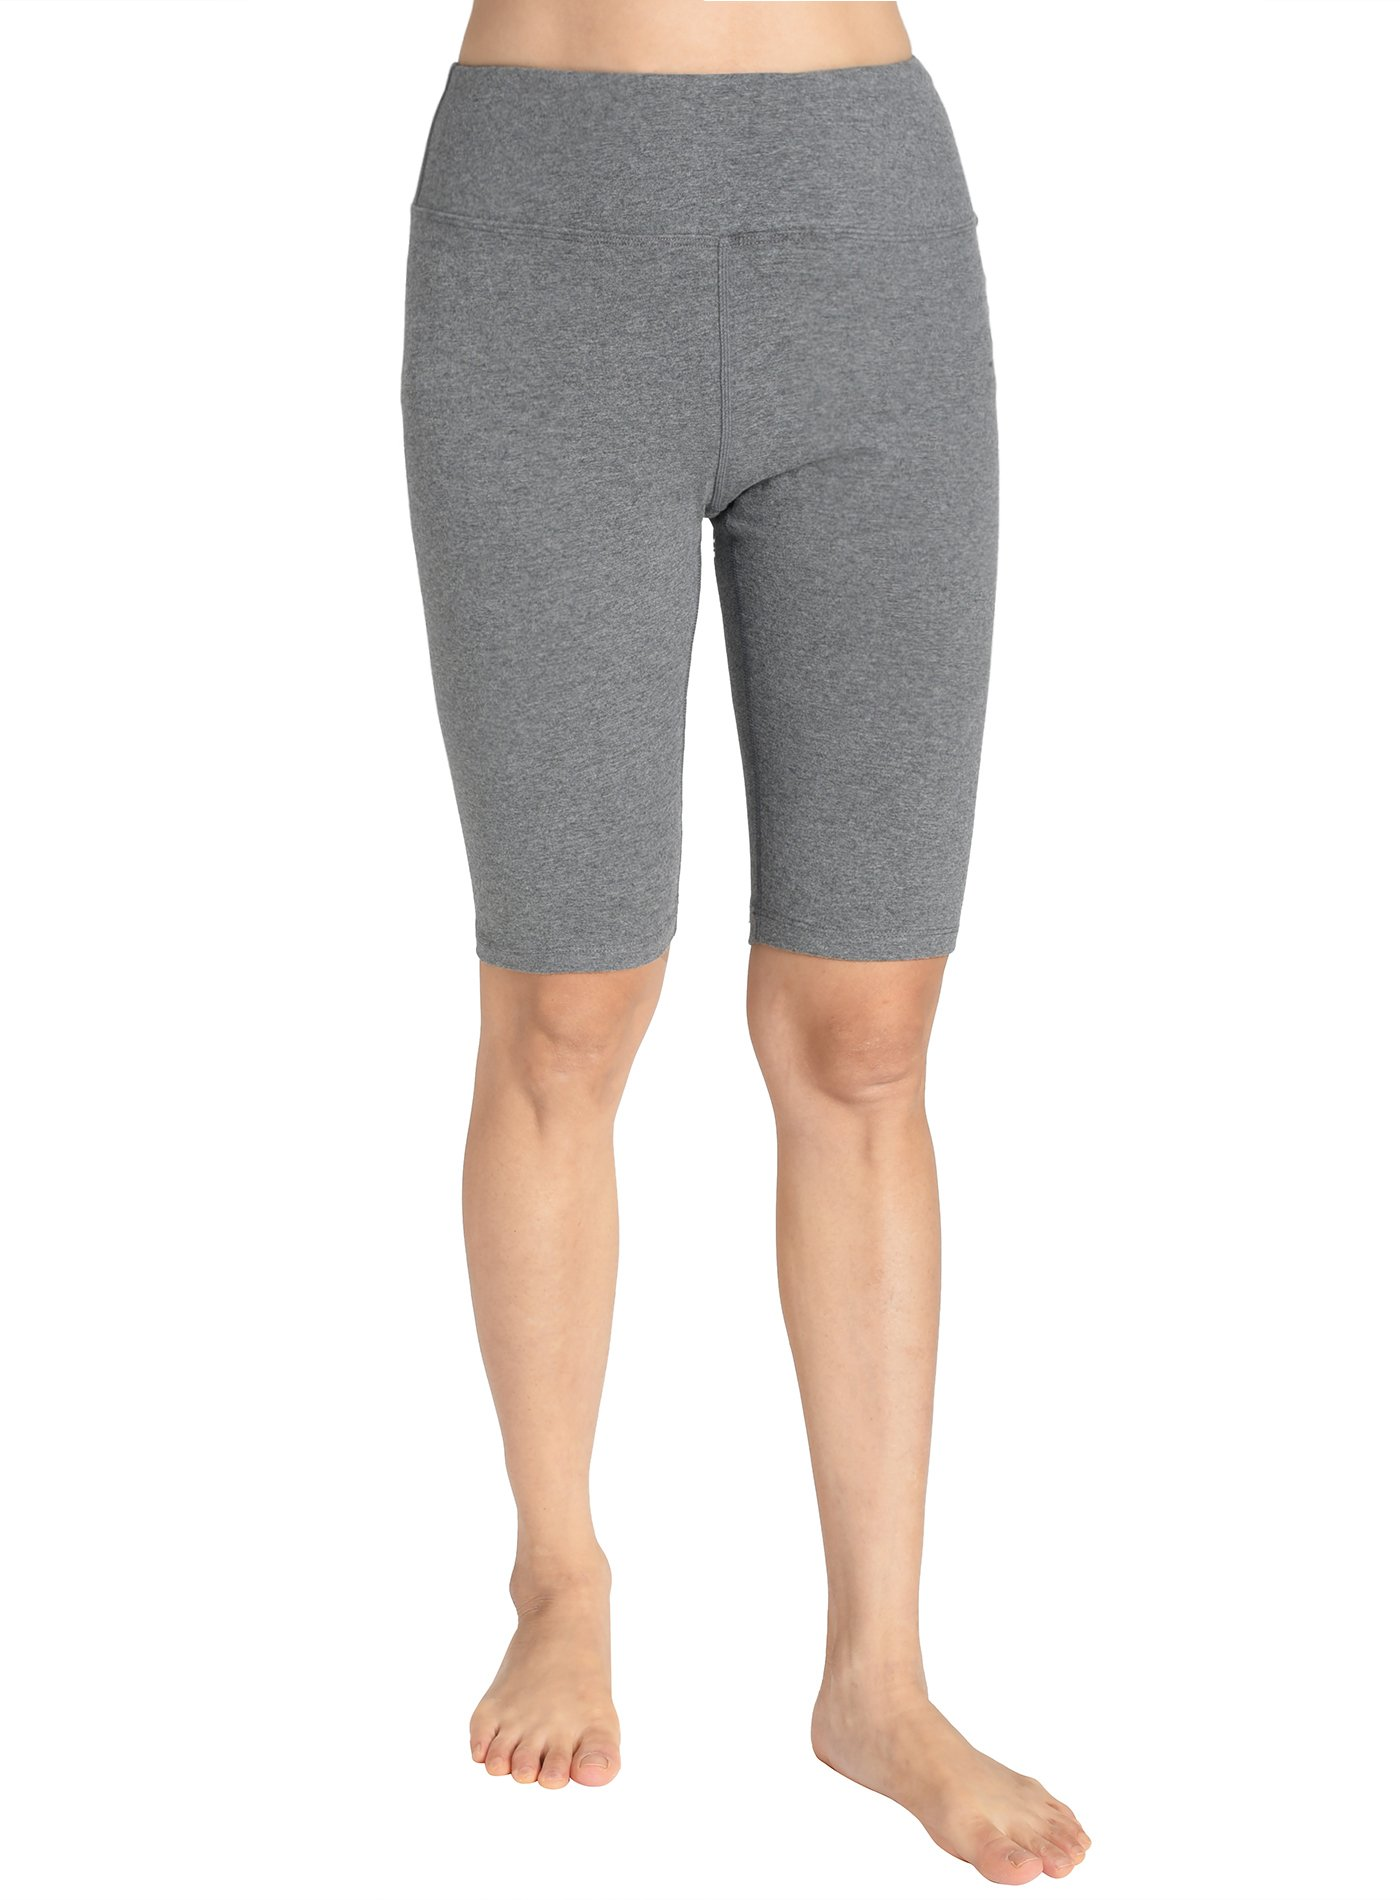 fea6ee531a Galleon - Weintee Women's Cotton Spandex Yoga Shorts Workout Gym Shorts S  Heather Gray